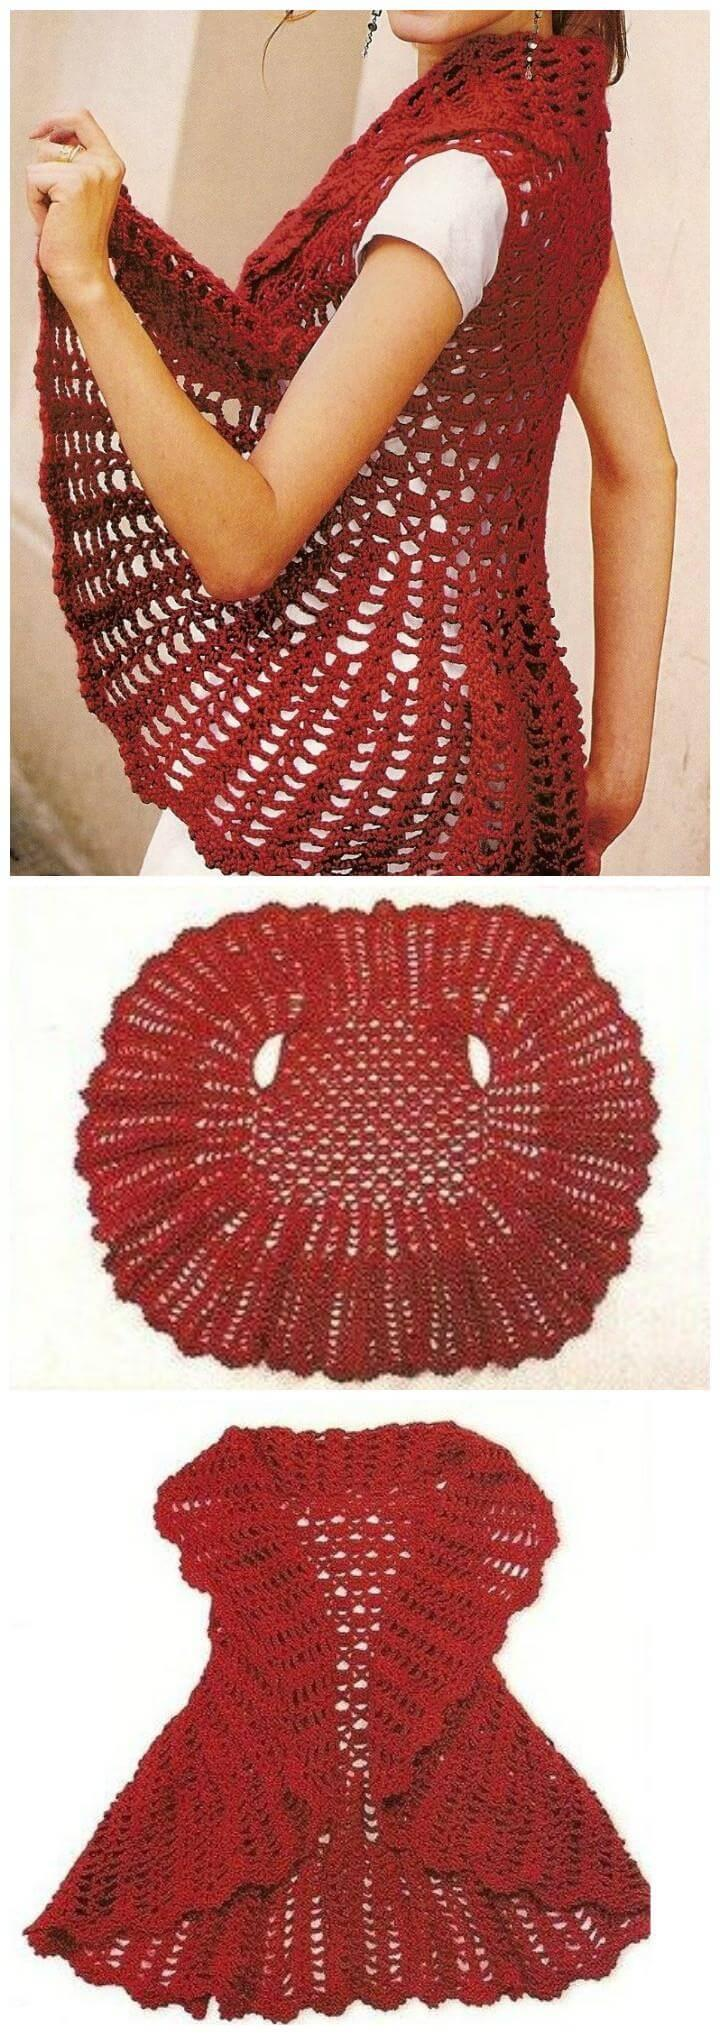 12 Free Crochet Patterns for Circular Vest Jacket – 101 Crochet Patterns